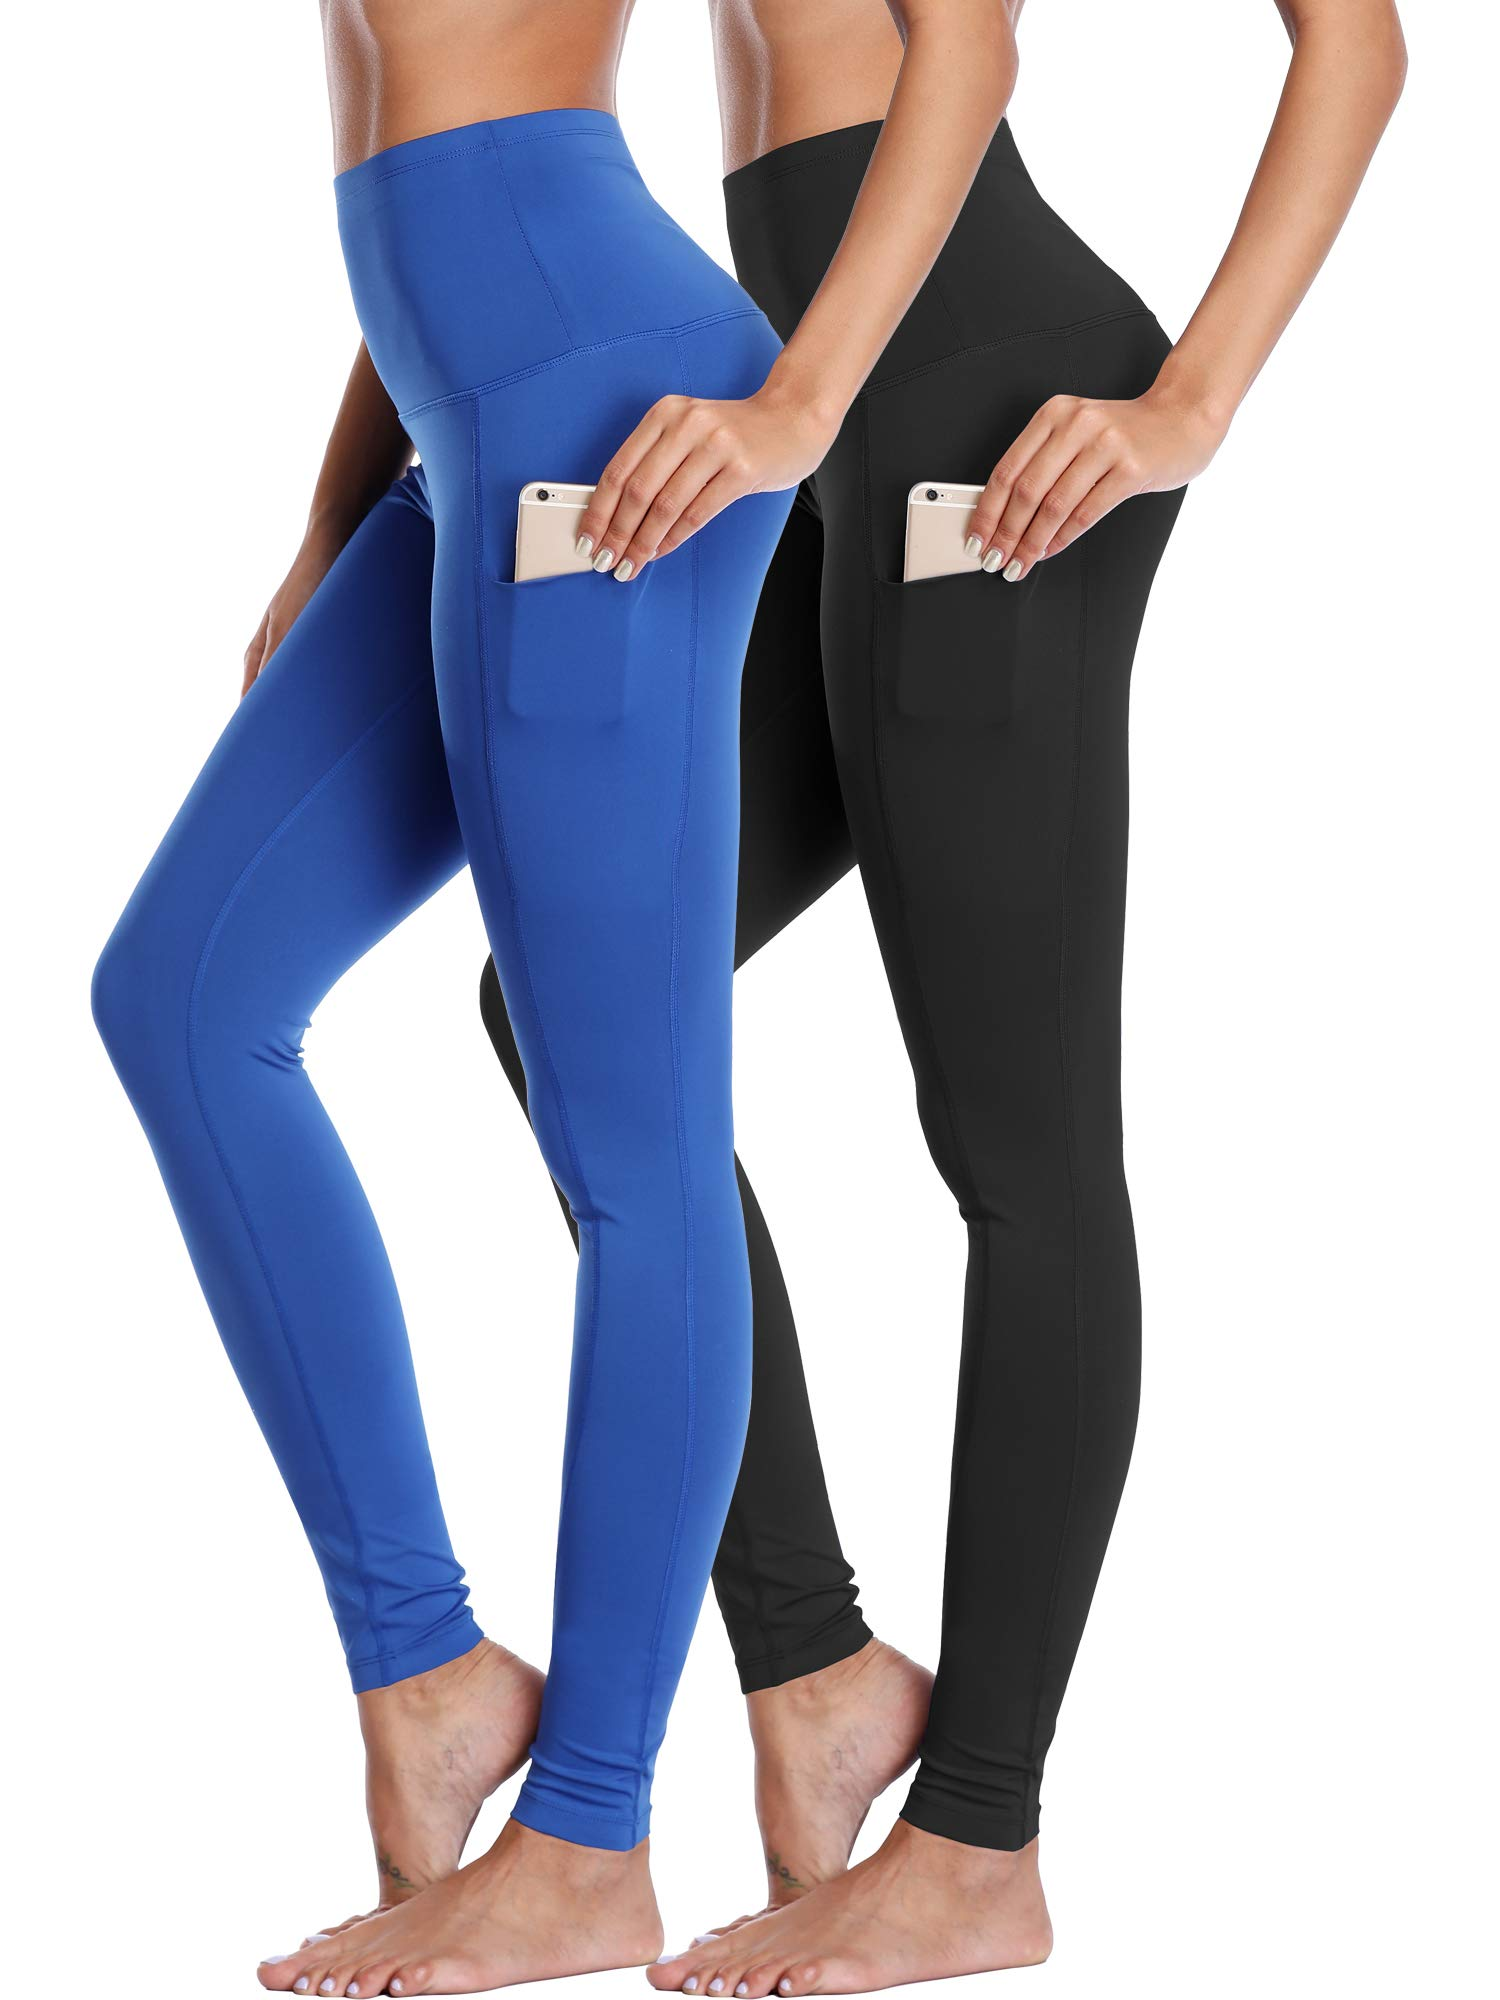 Neleus Women's 2 Pack Yoga Leggings Tummy Control Workout Yoga Pant,103,Black,Blue,L by Neleus